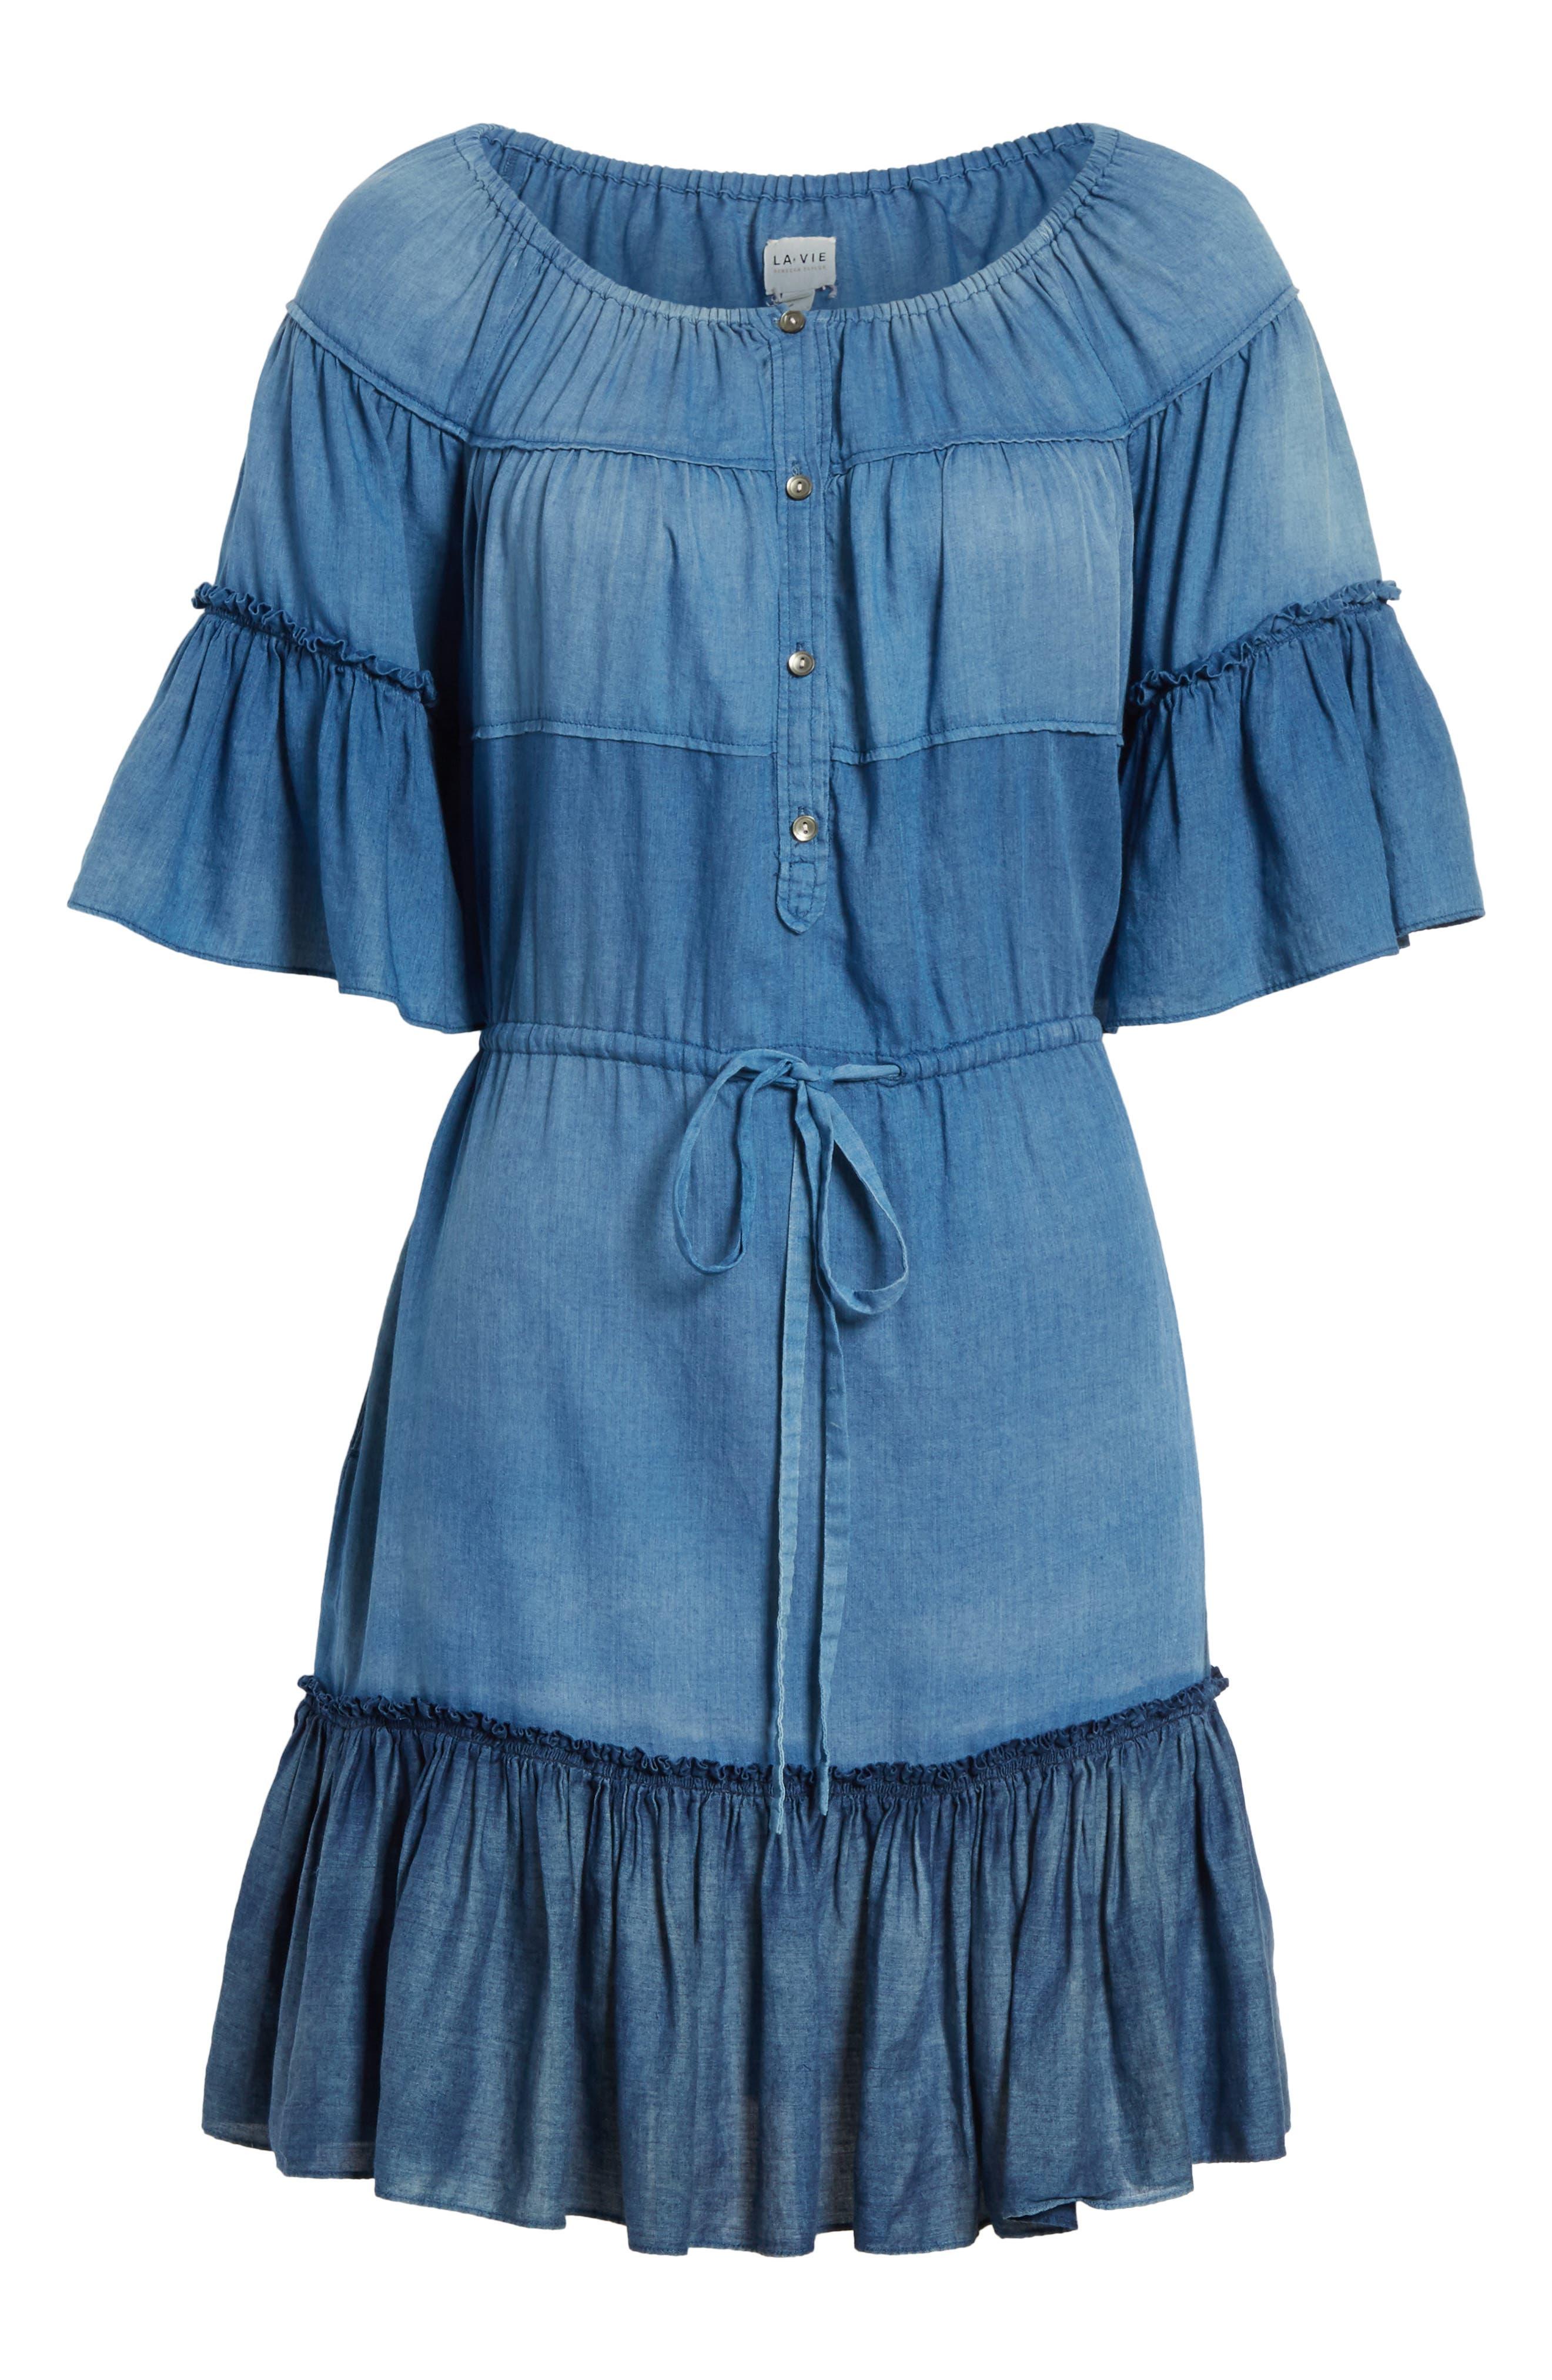 Ruffle Tissue Denim Dress,                             Alternate thumbnail 6, color,                             453